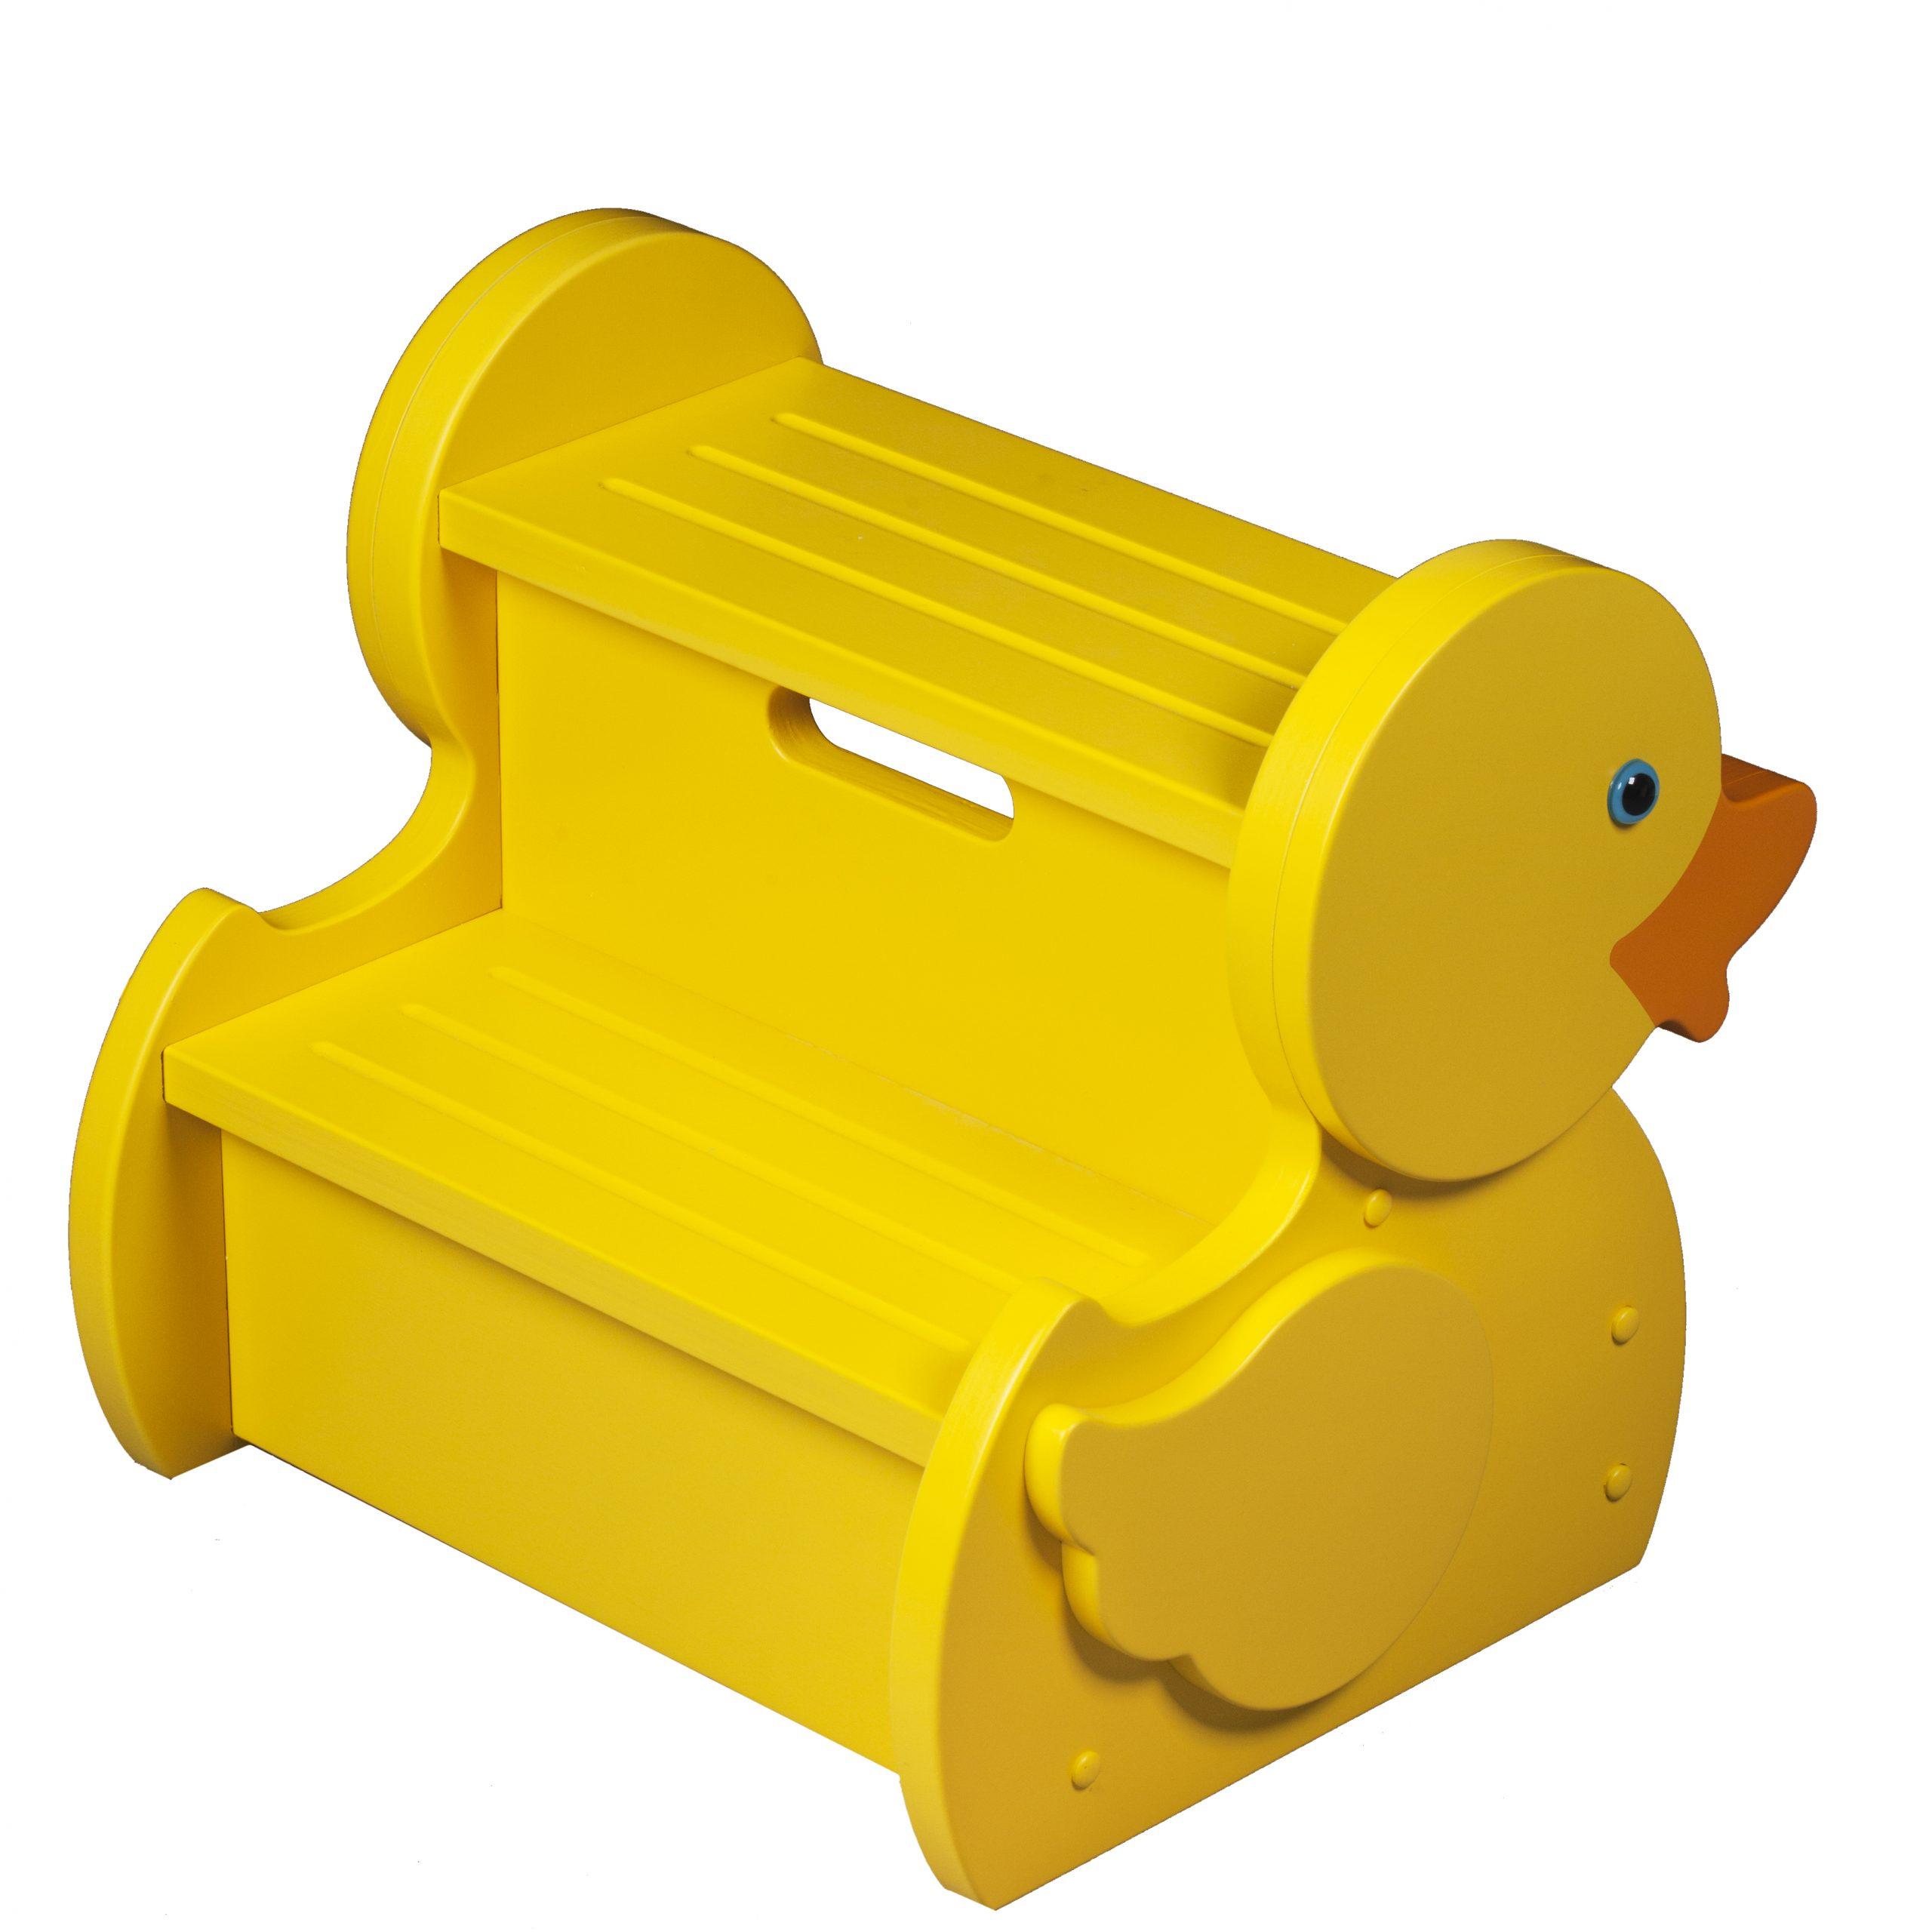 Duck Step Stool